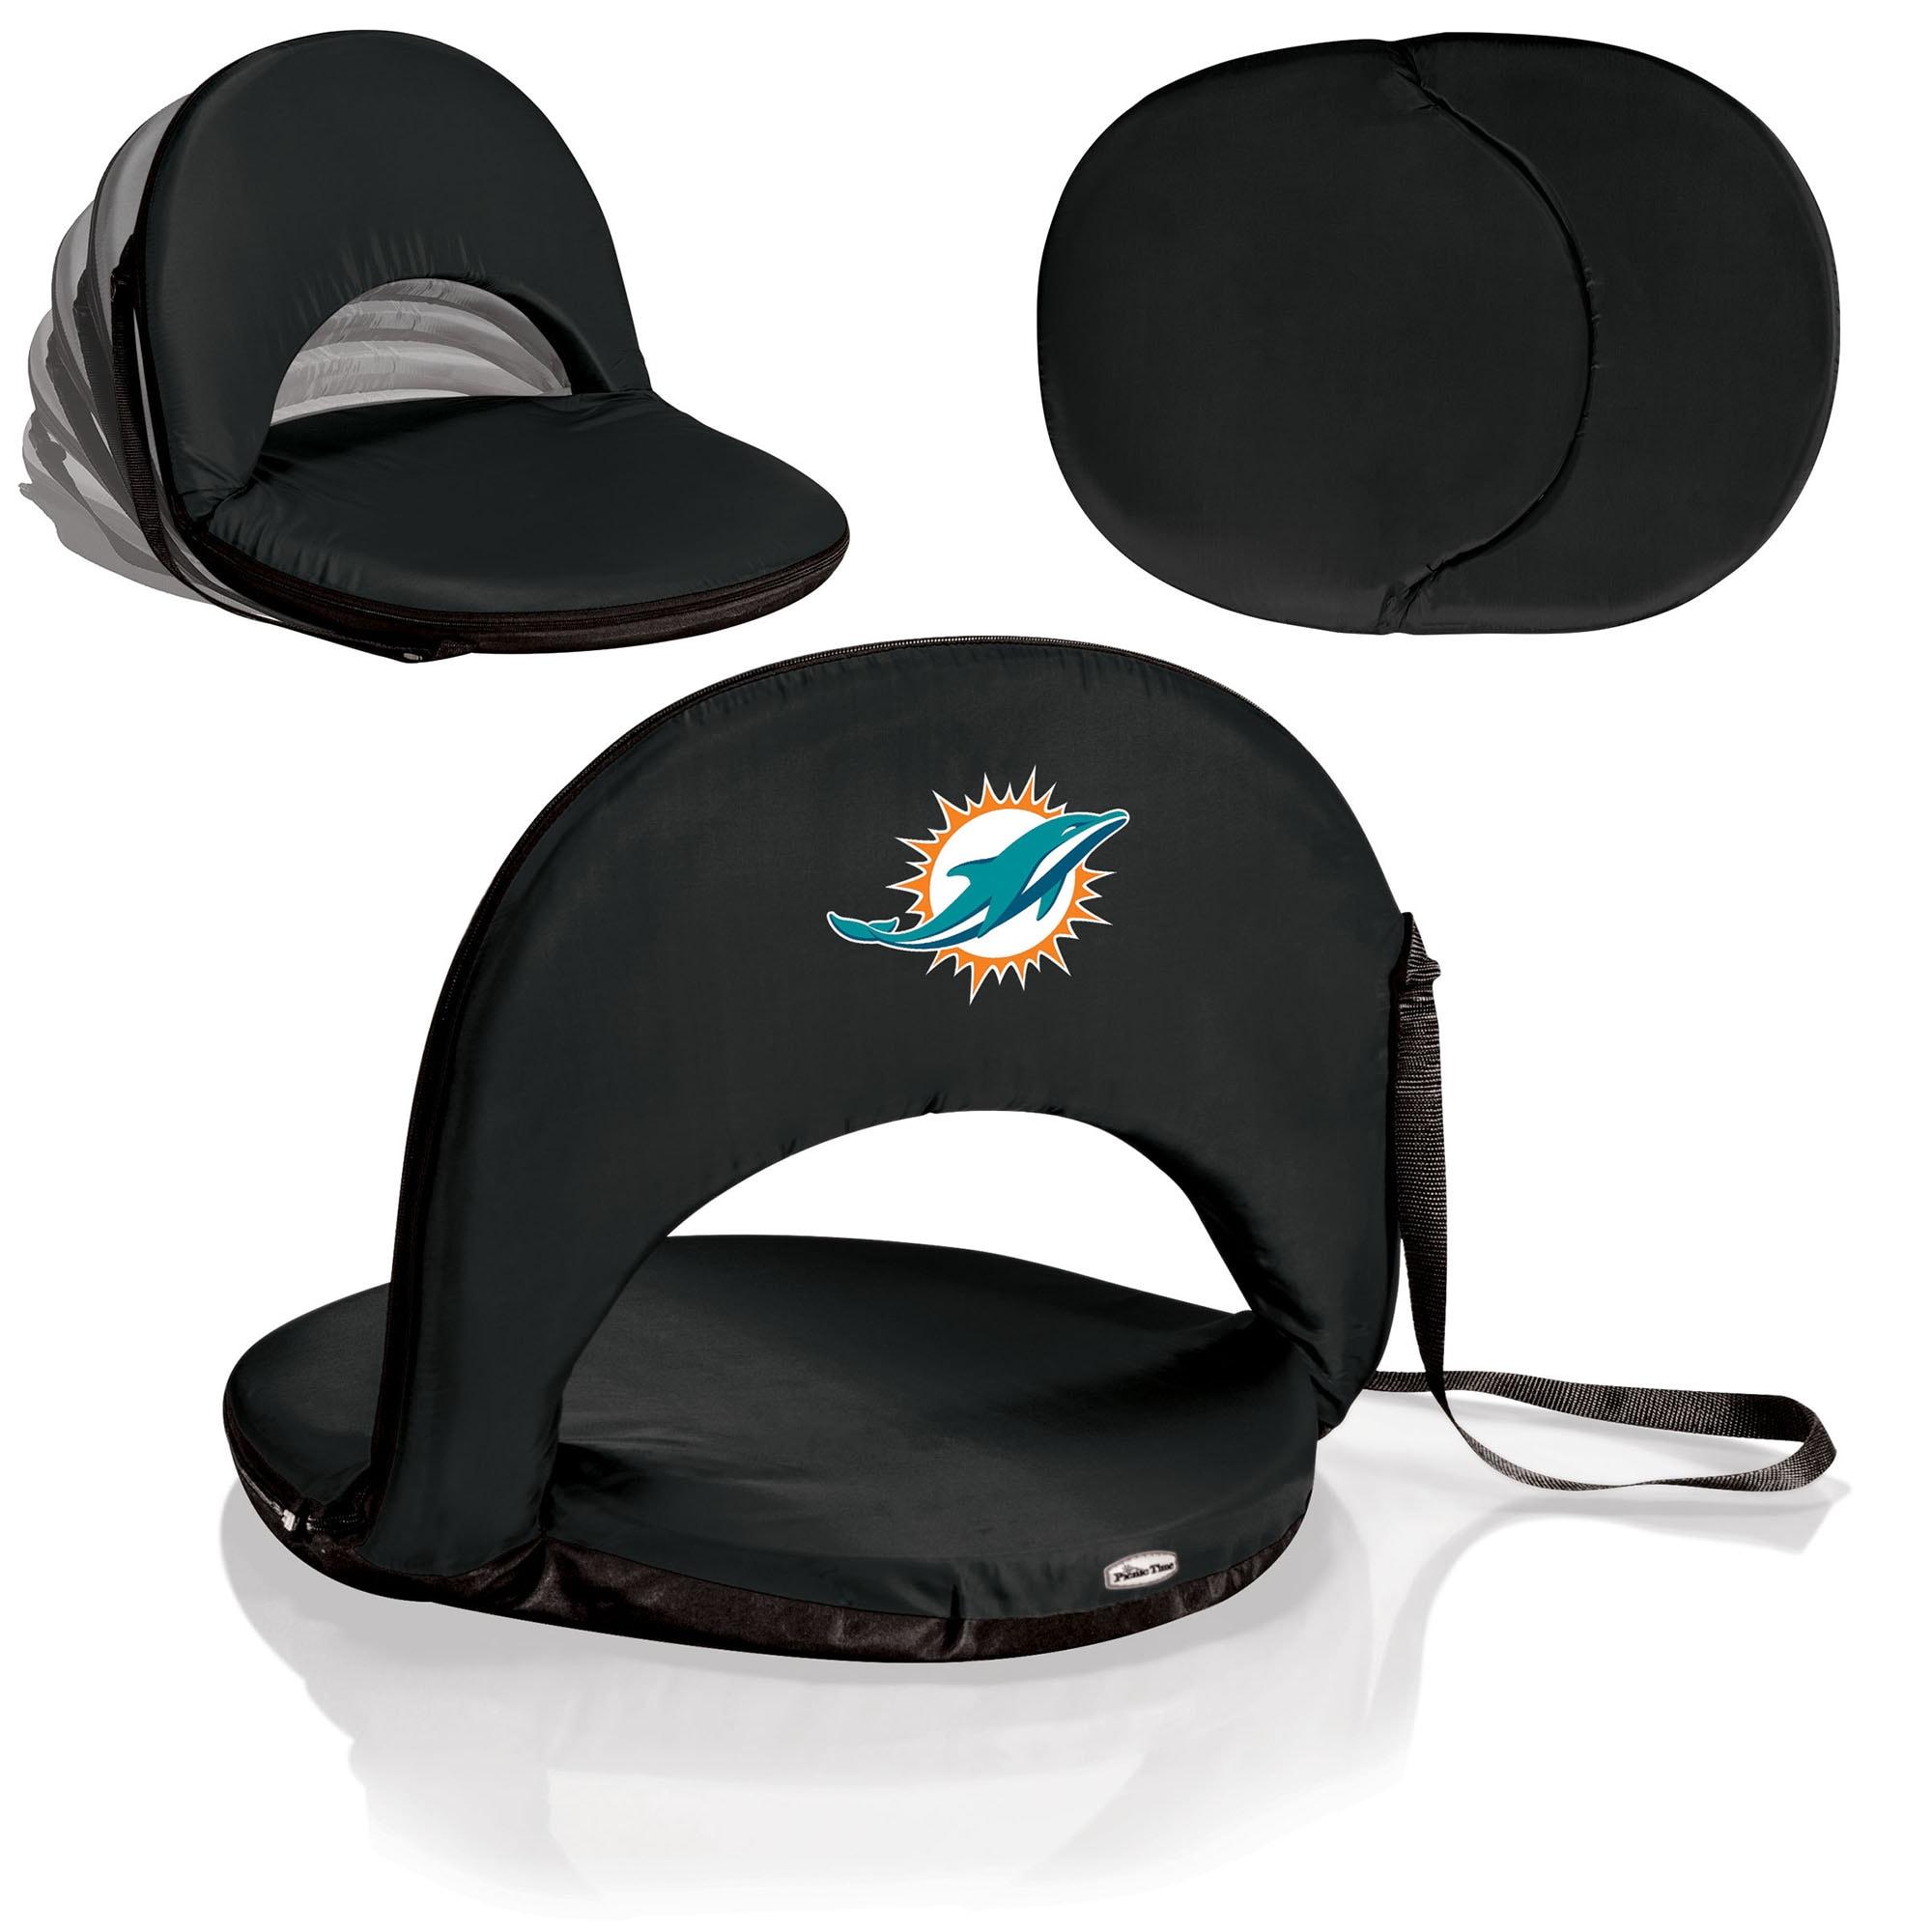 Miami Dolphins Oniva Stadium Seat - Black